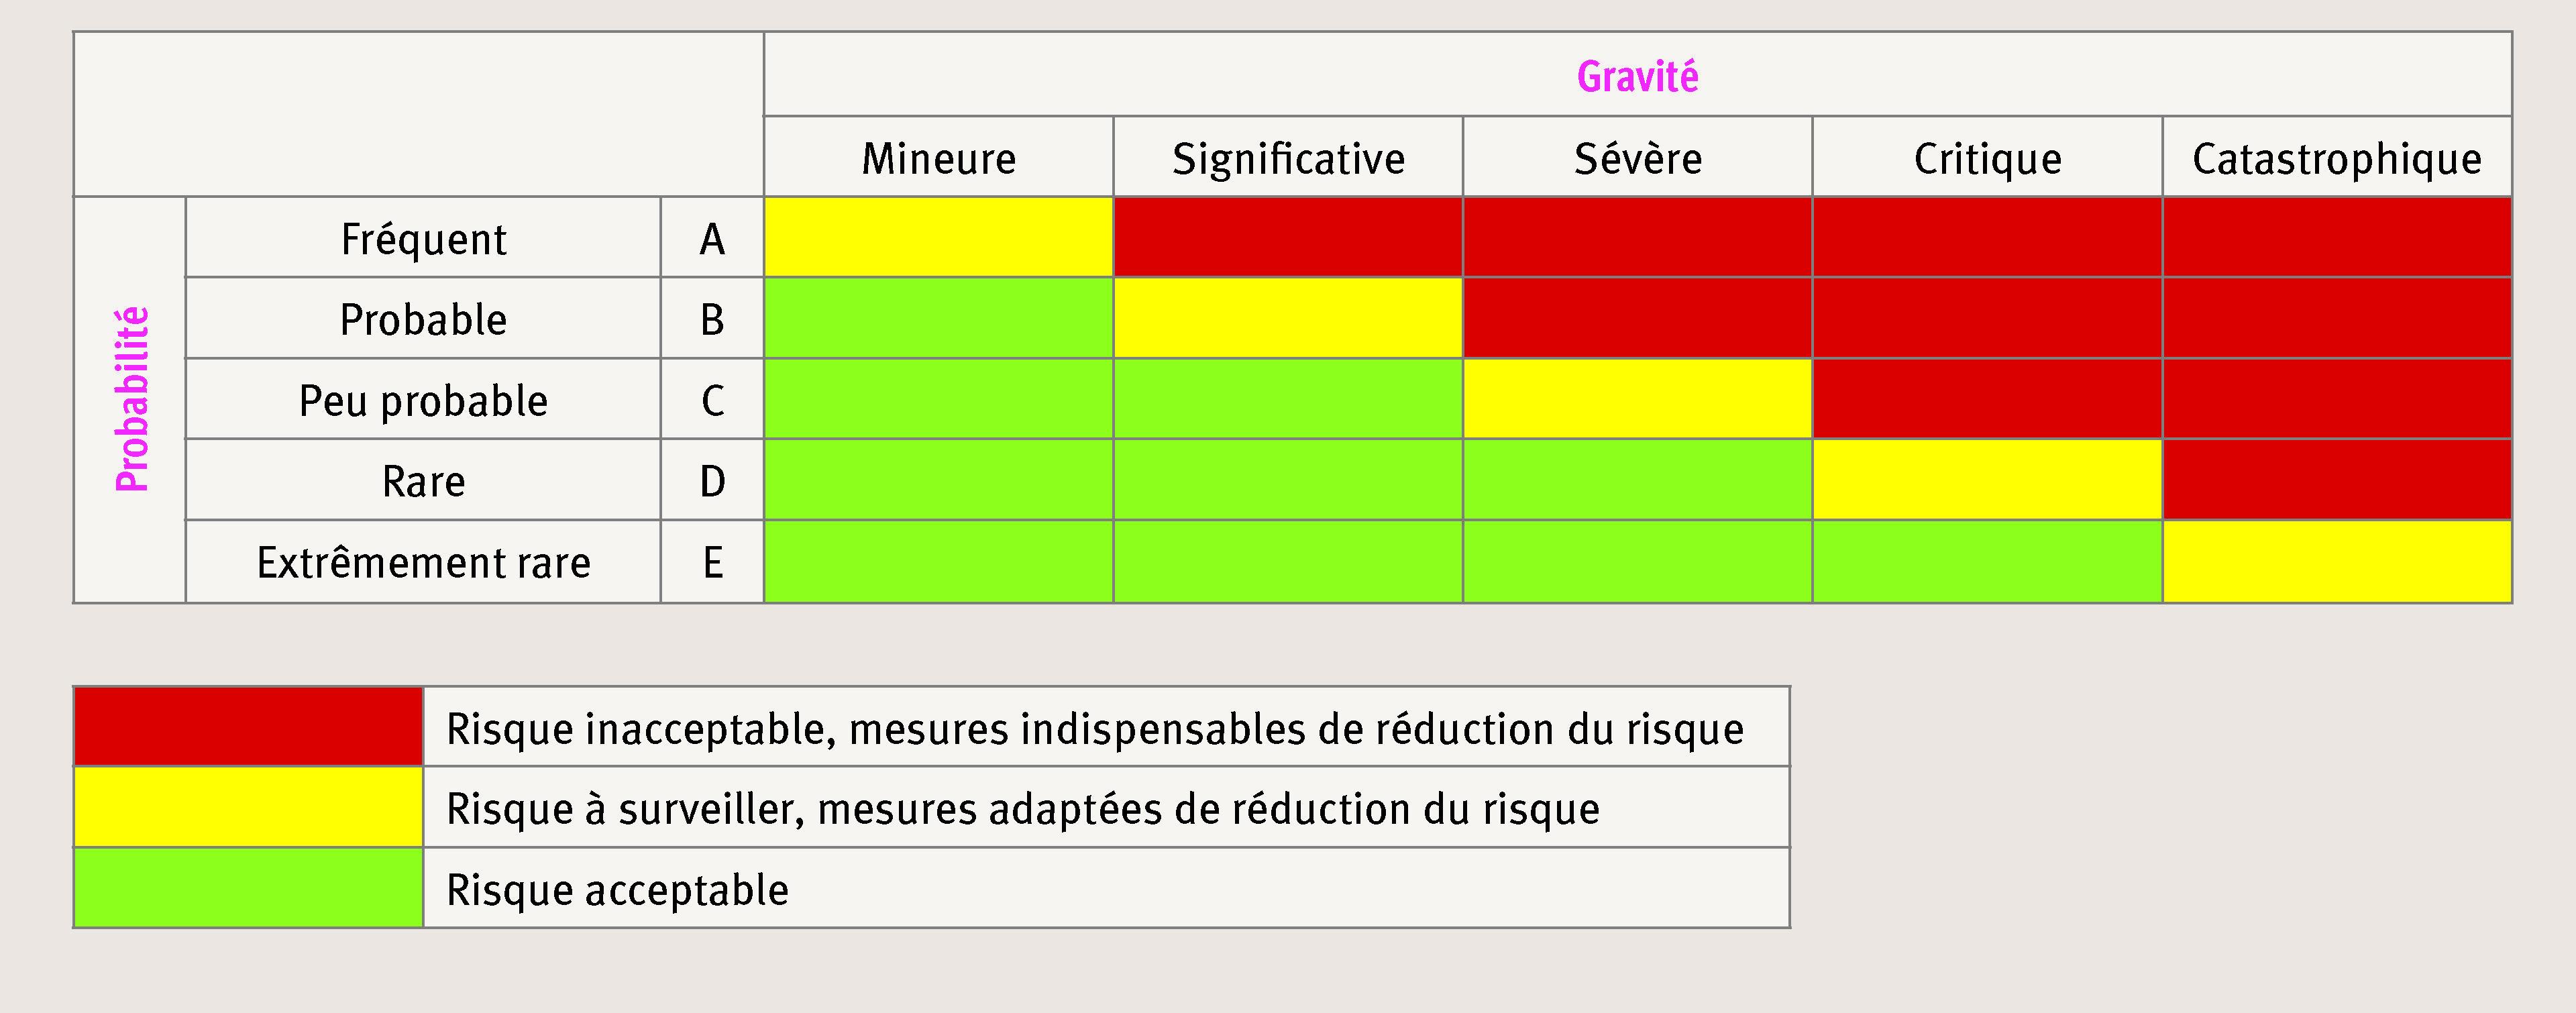 exemple de matrice de vuln u00e9rabilit u00e9